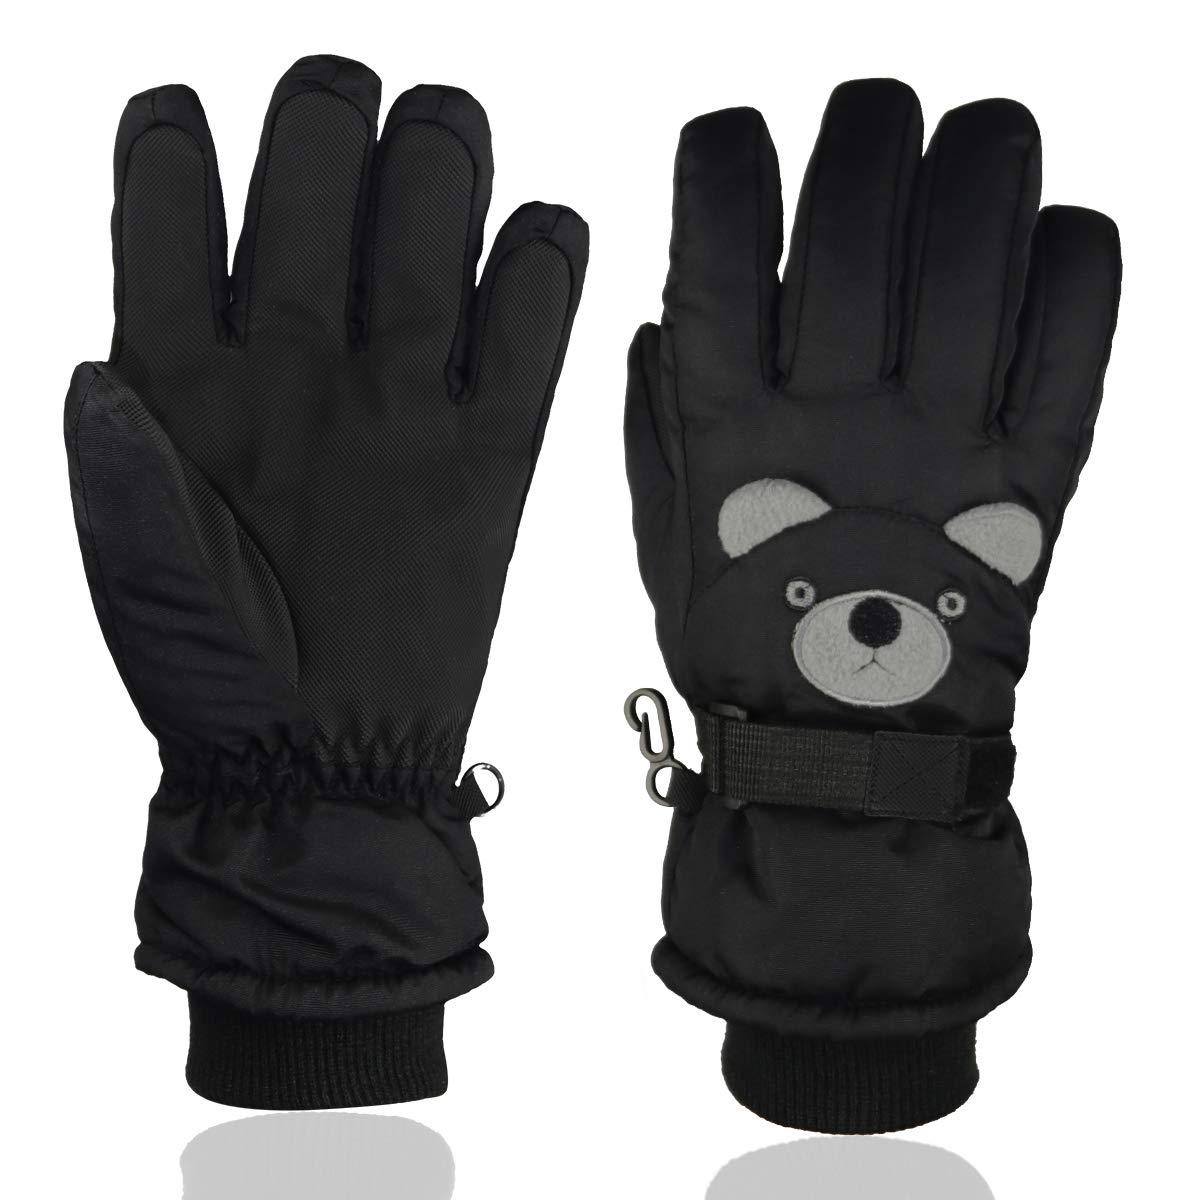 Kids Ski Gloves Snow Outdoor Winter Sports For Snowboarding,Kids Cute Skiing Gloves Mittens Momoon